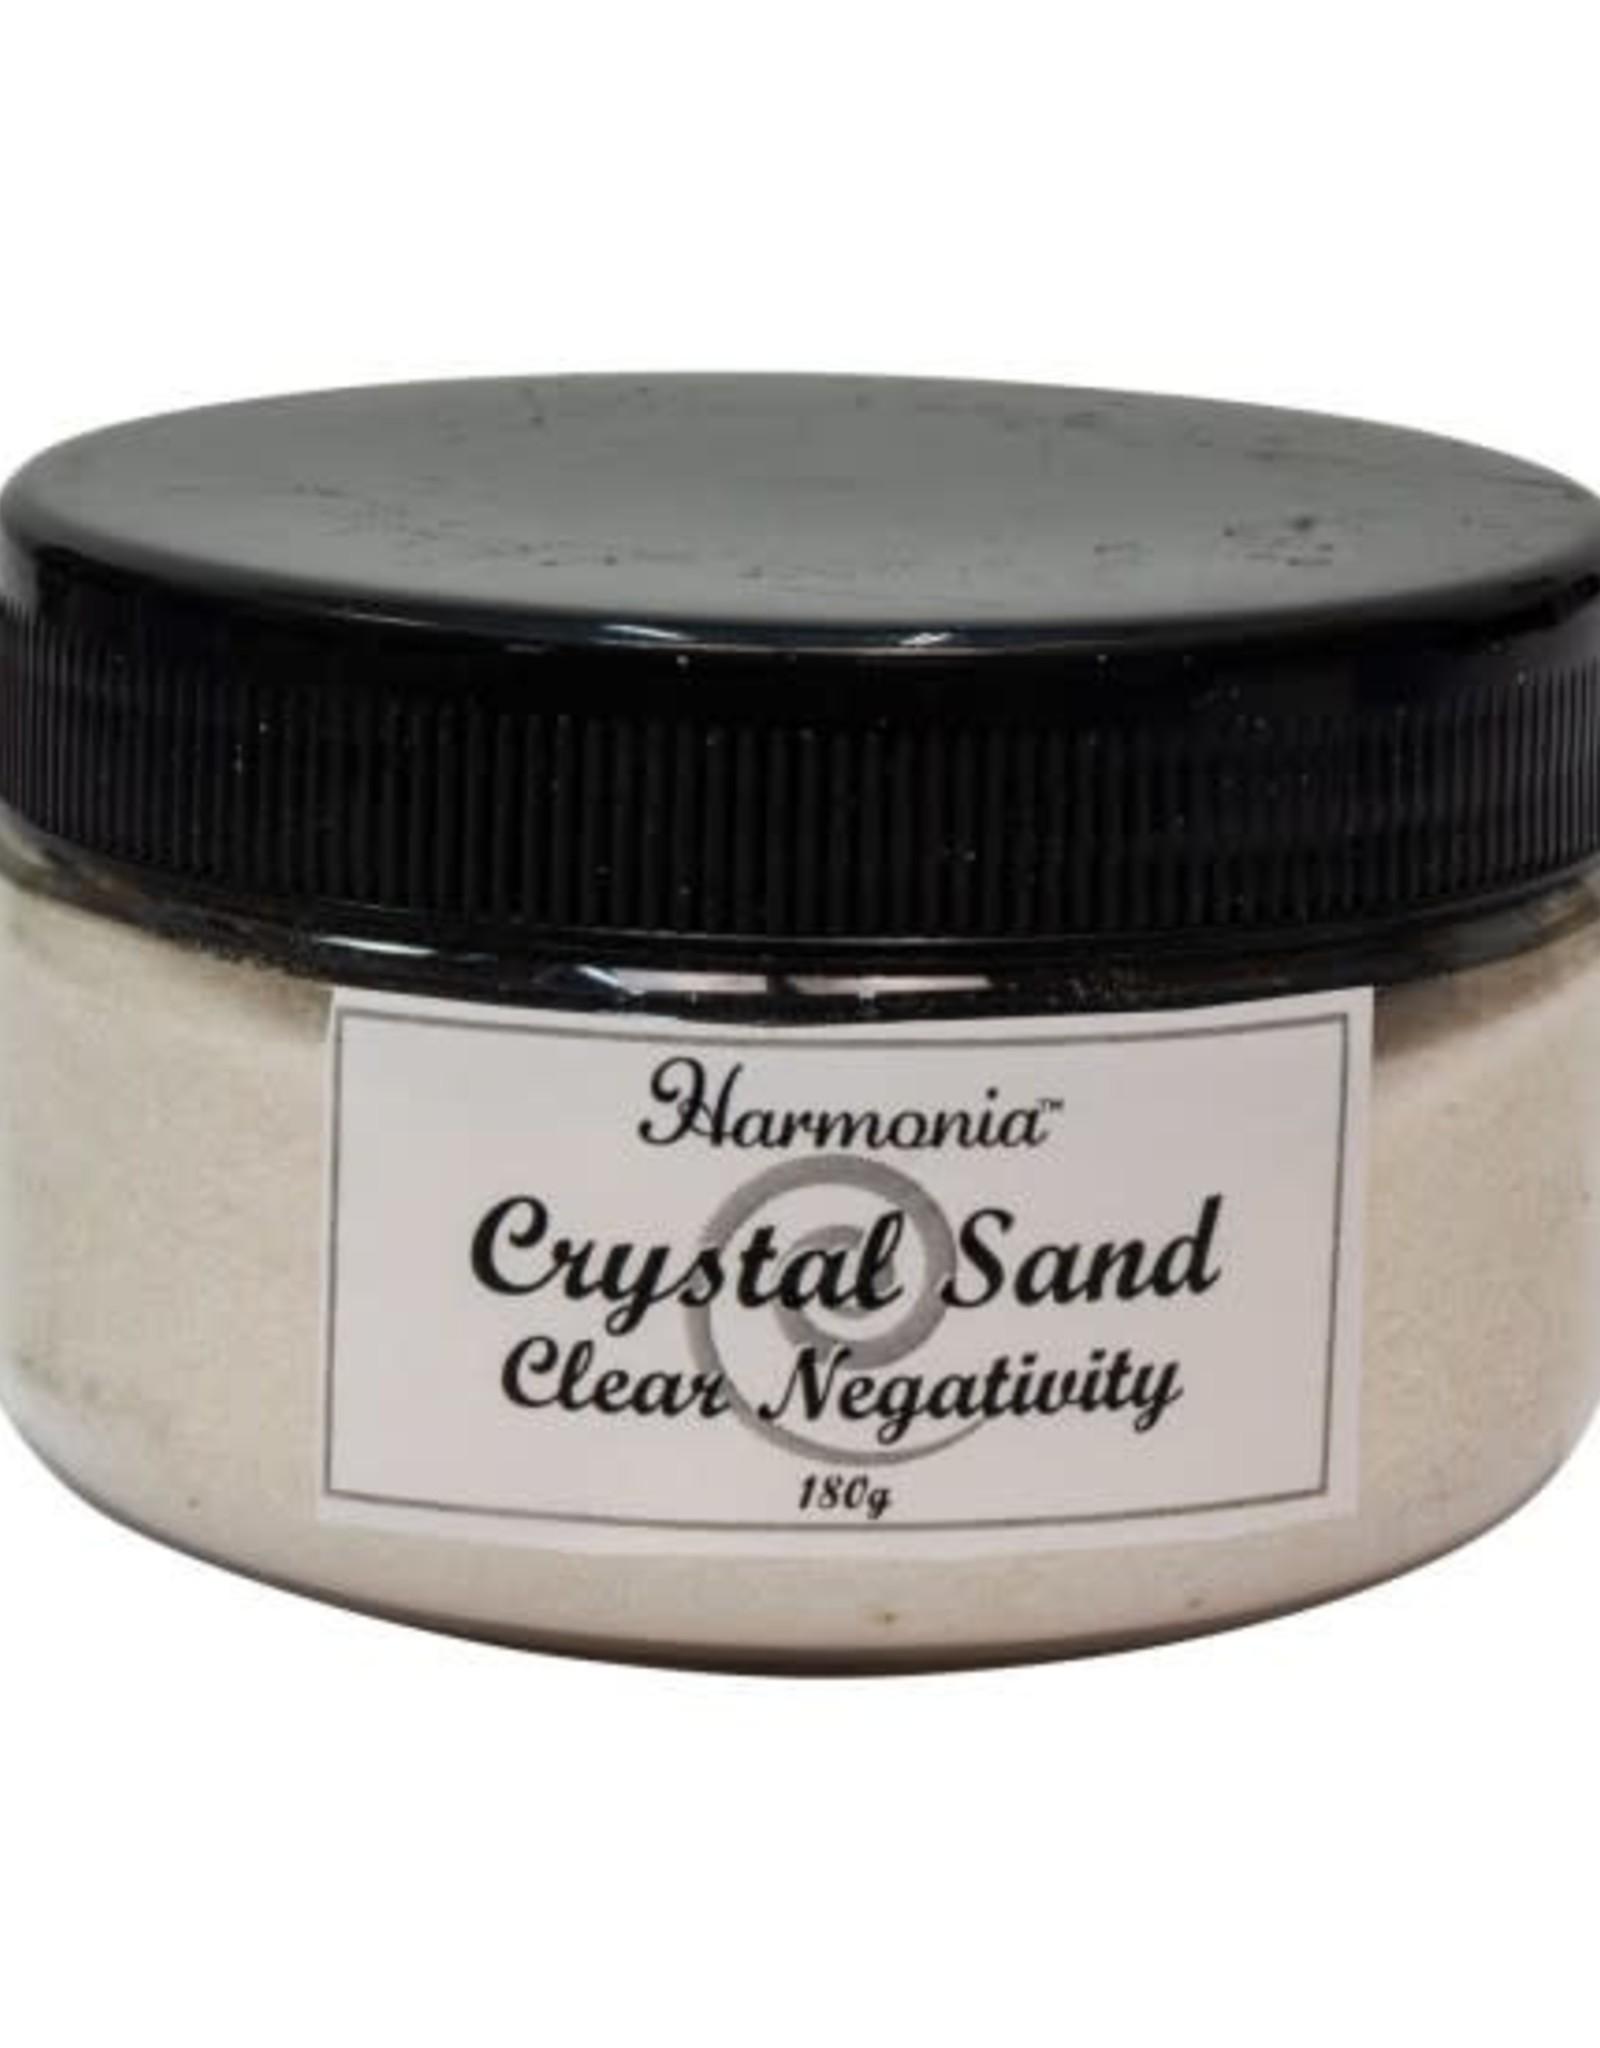 Clear Quartz Crytsal Sand- Clear Negativity